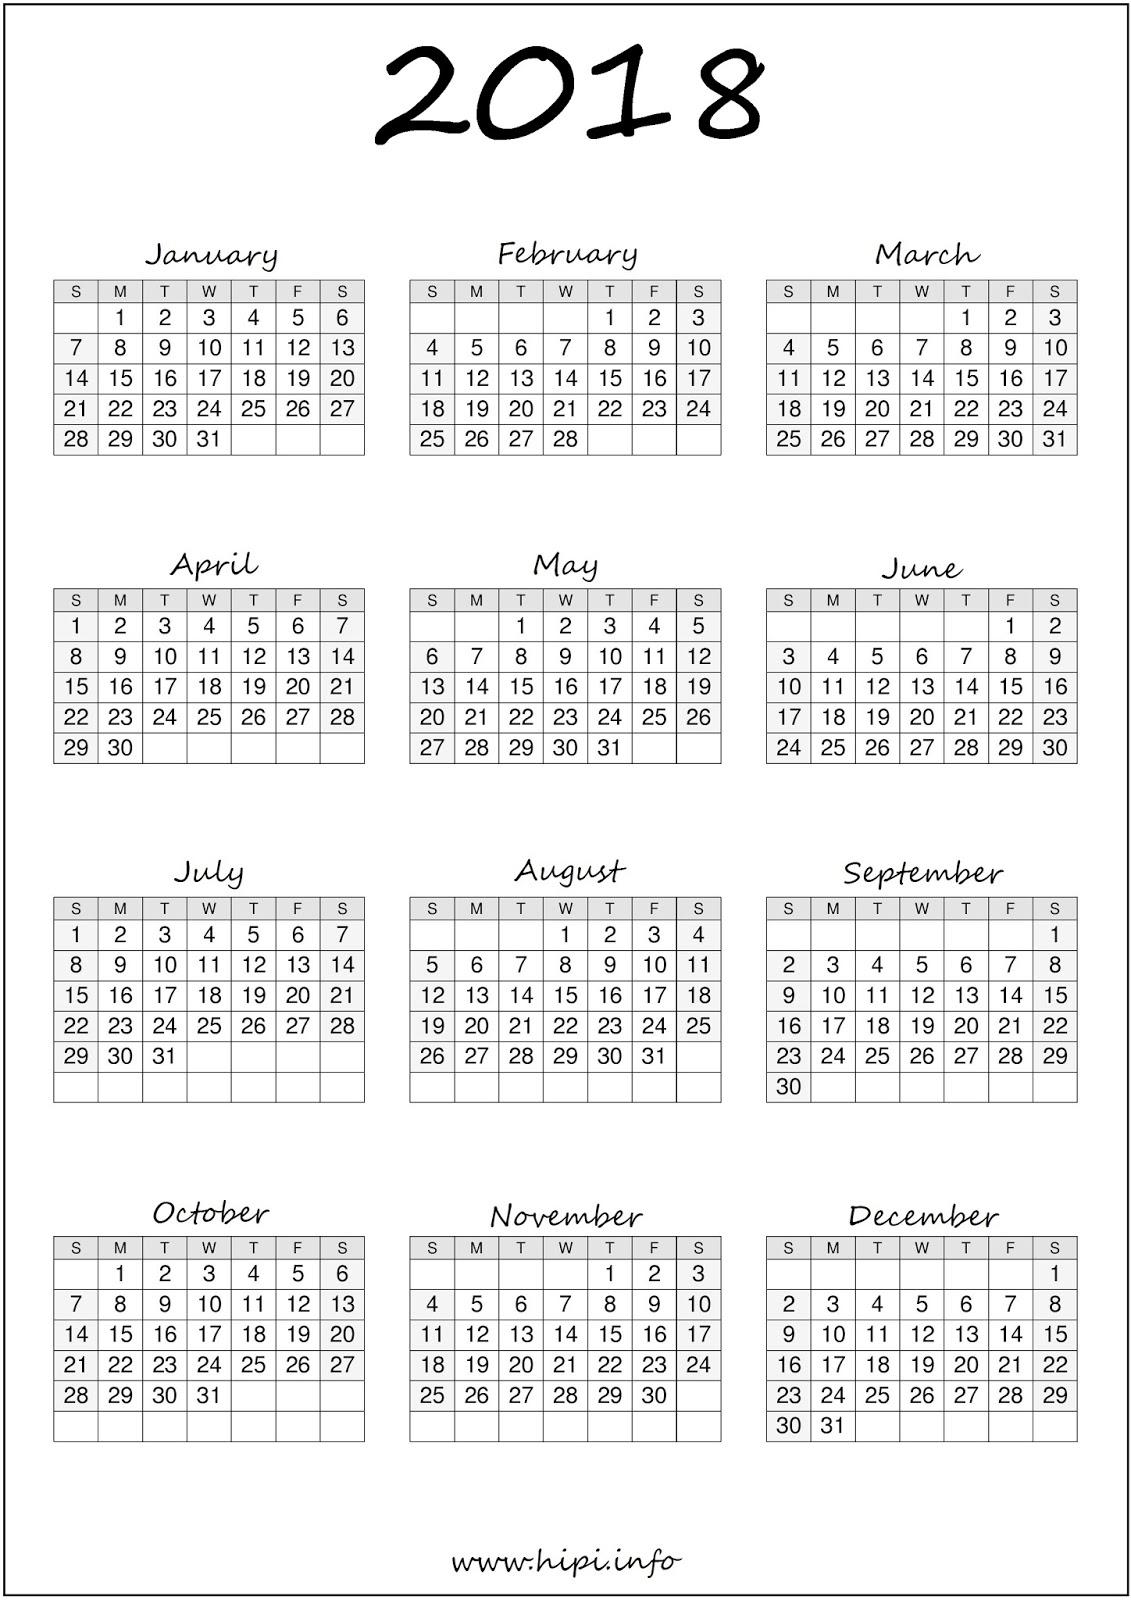 Bullet Journal Printable Calendar 2018 A4 Download Free Printable Graphics